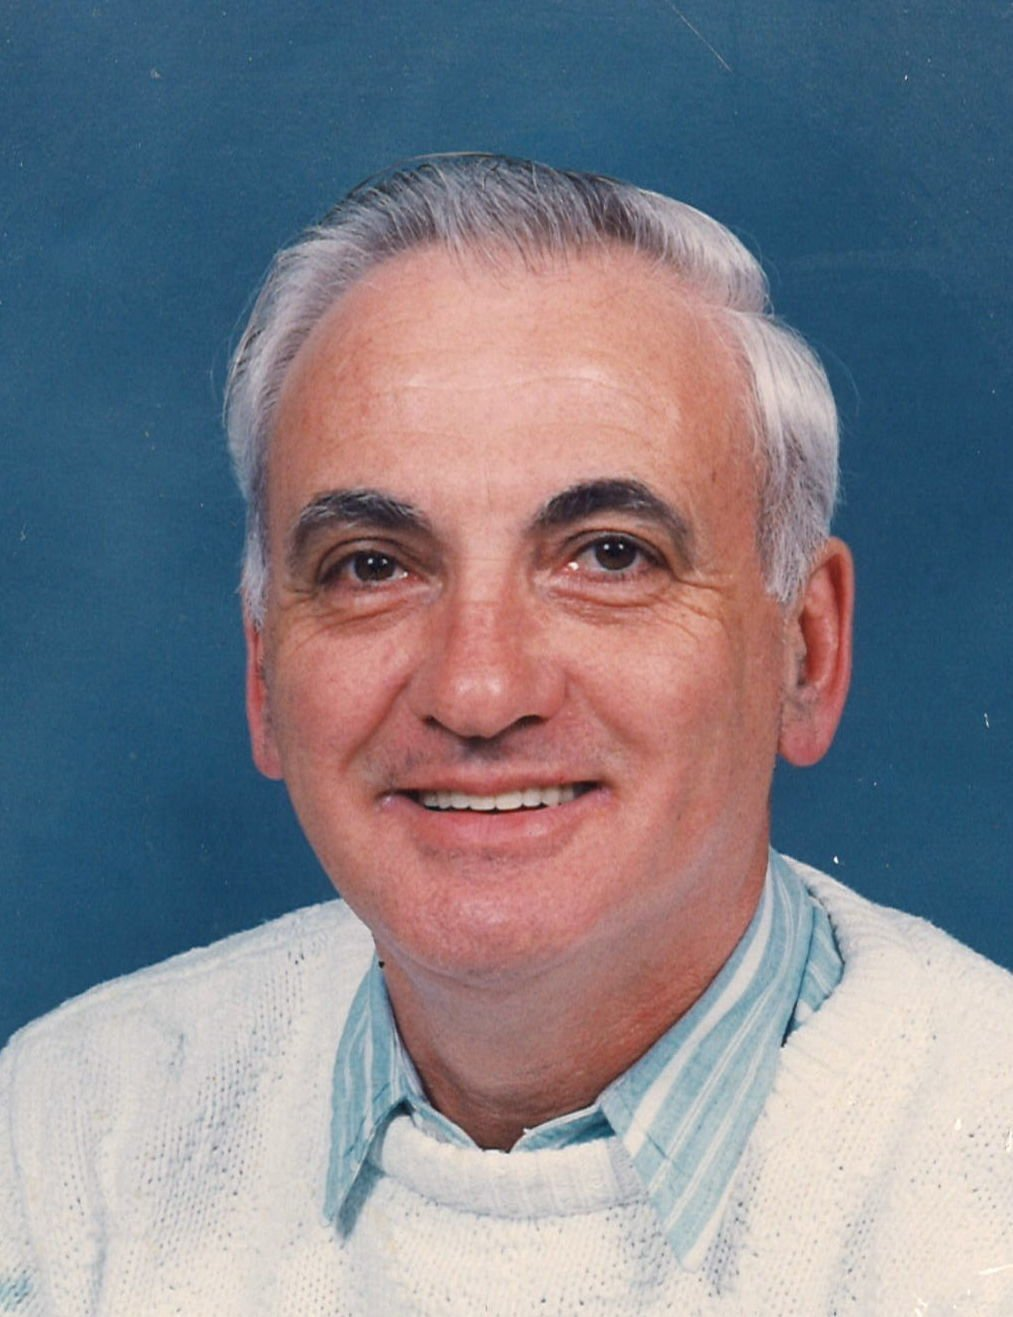 Richard Weeks